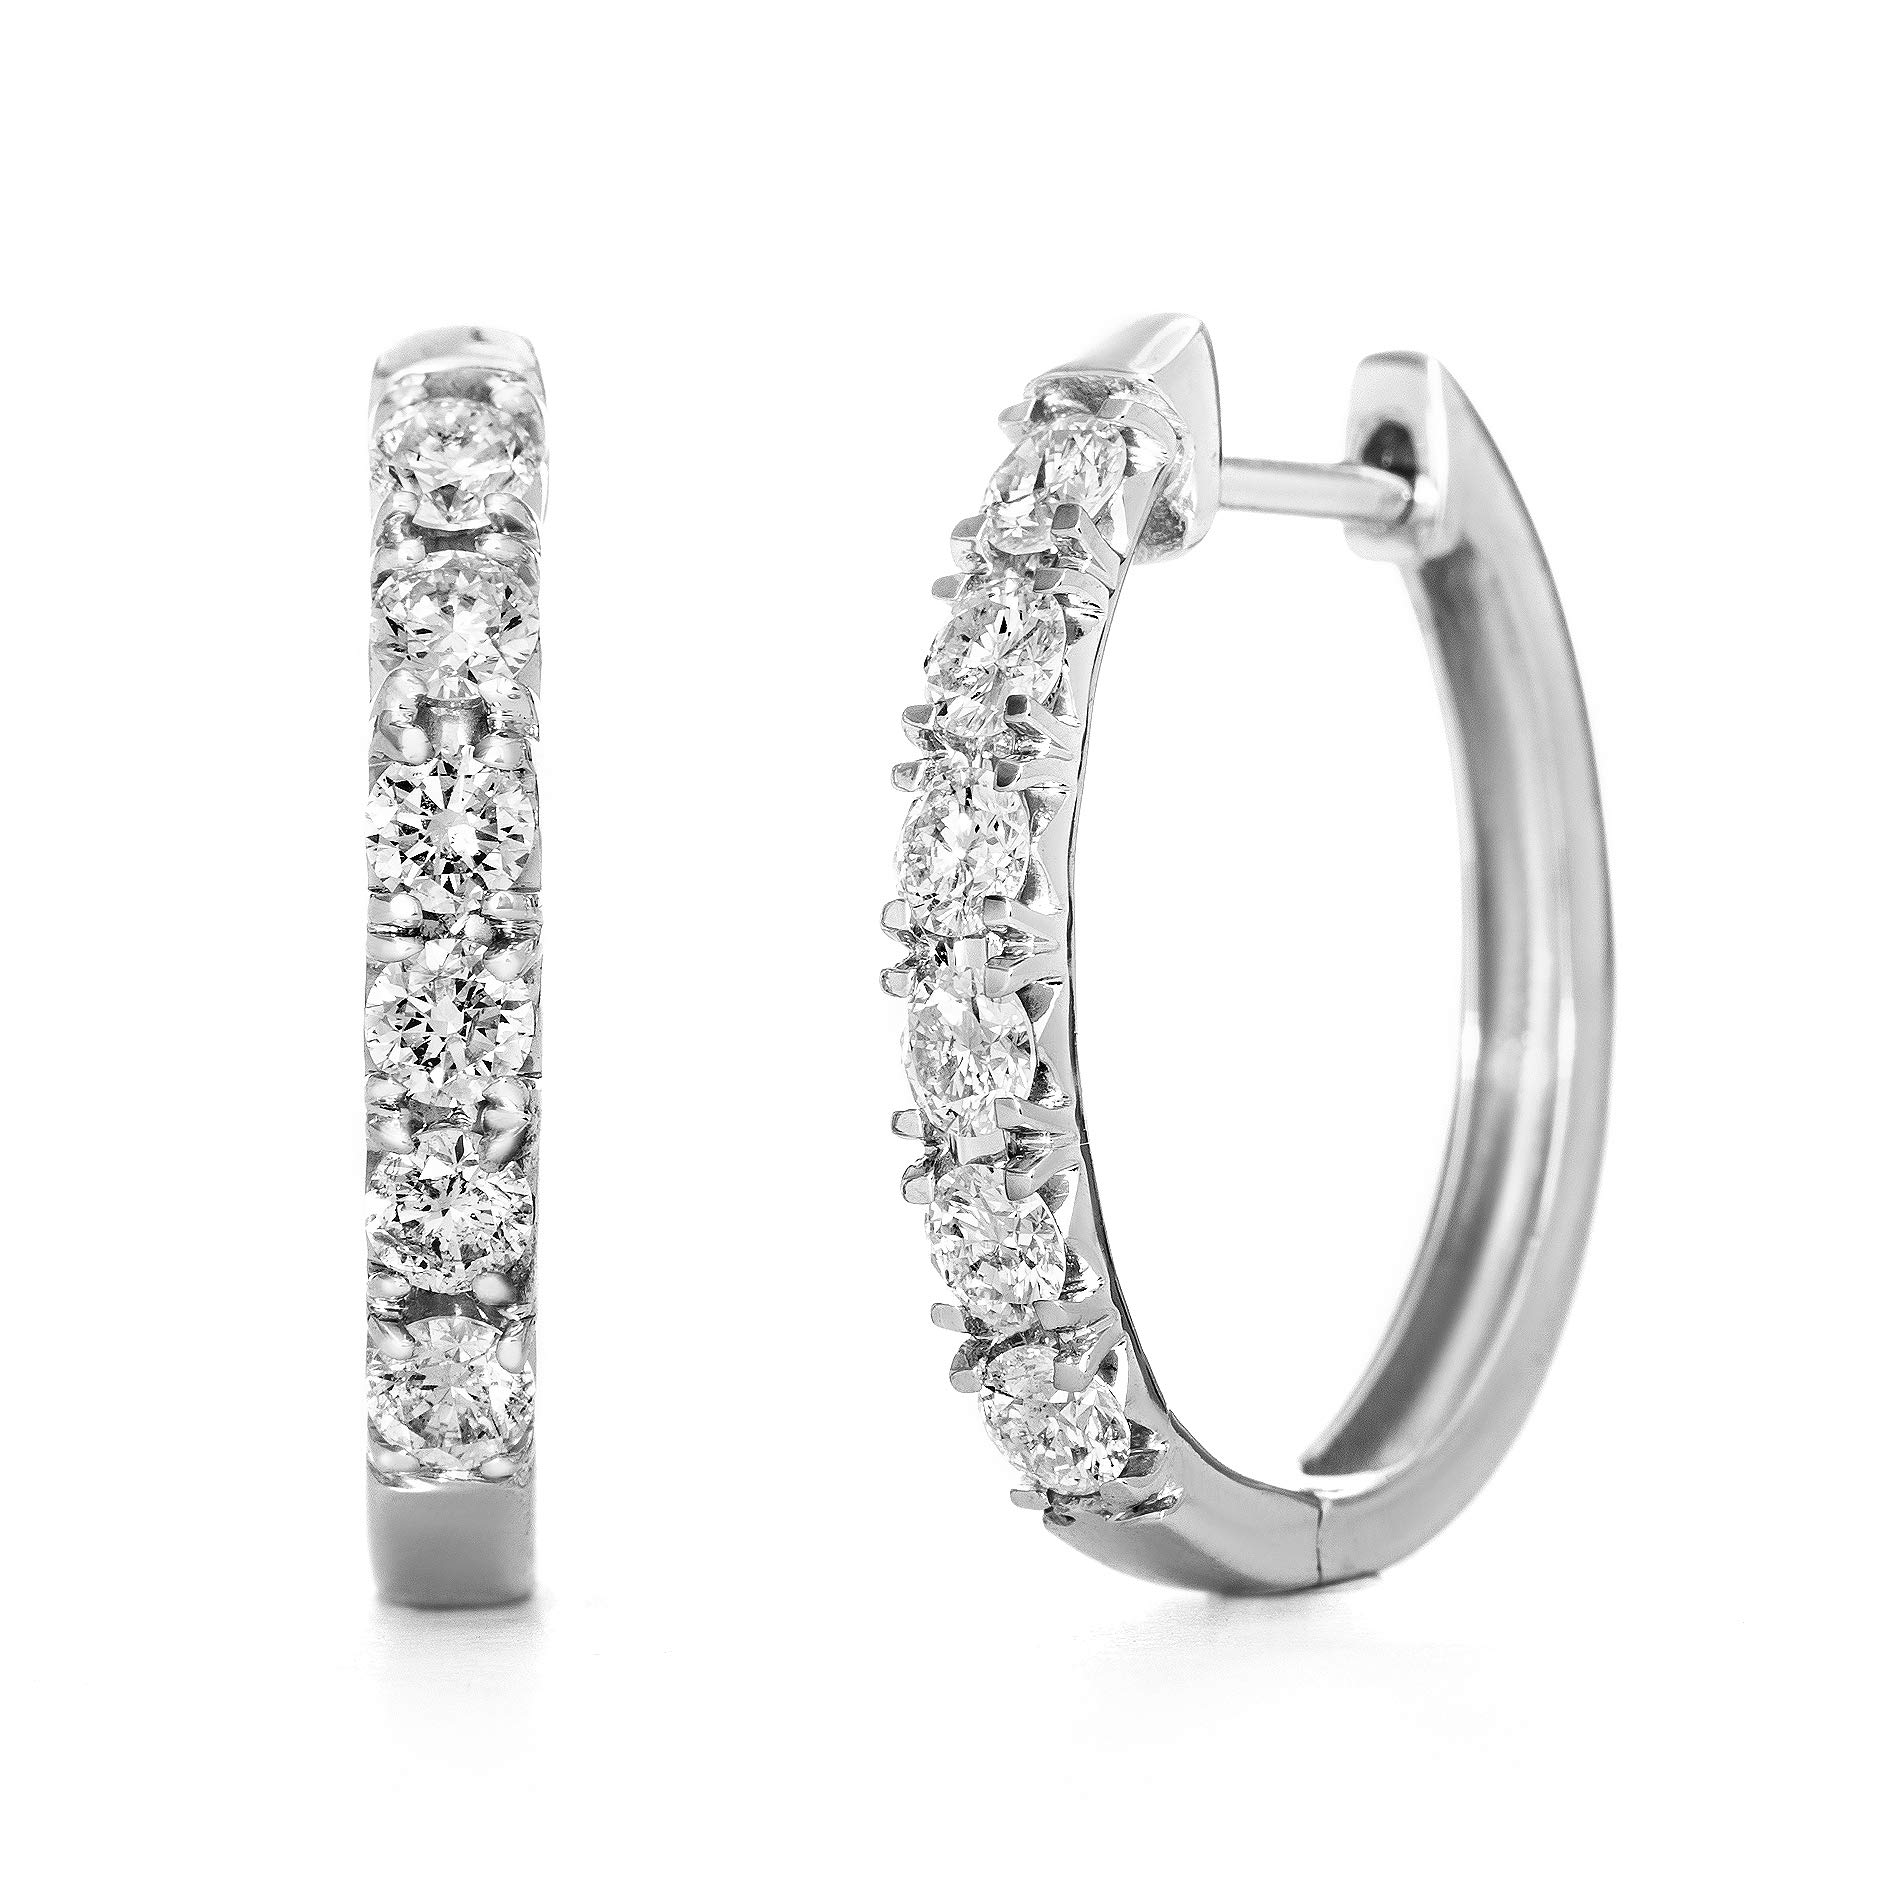 Devin Rose 10K White Gold 1 Cttw Diamond Hoop Earrings for Women (H Color I2 Clarity IGL Certified)